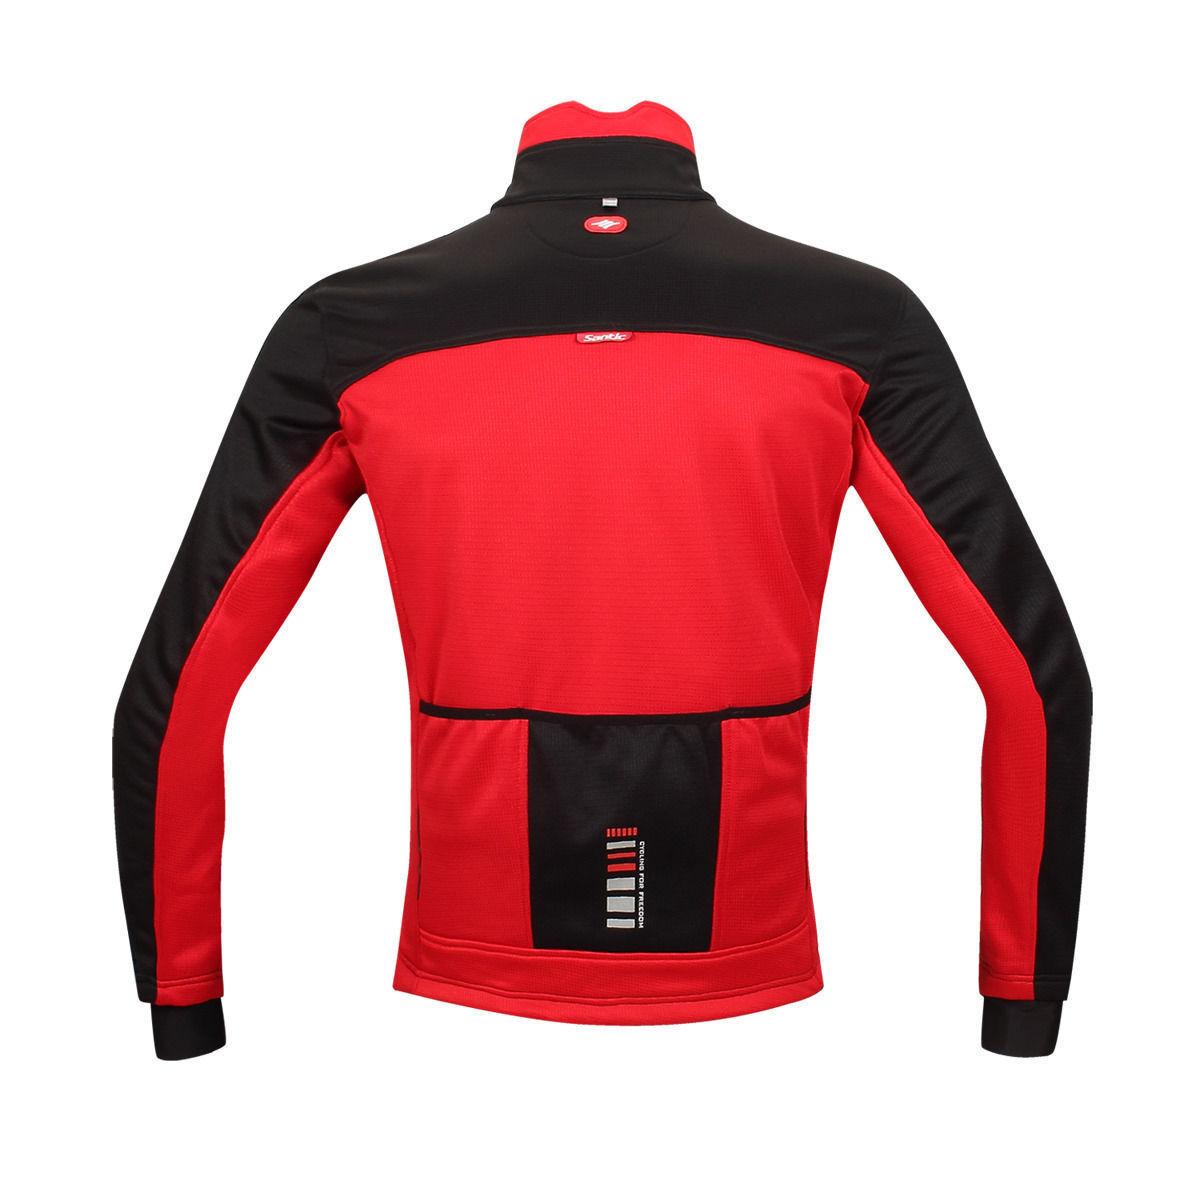 Men s Winter Cycling Jerseys Riding Jacket Bike Jackets Cycling Jersey 2  Colors 0aaa88222